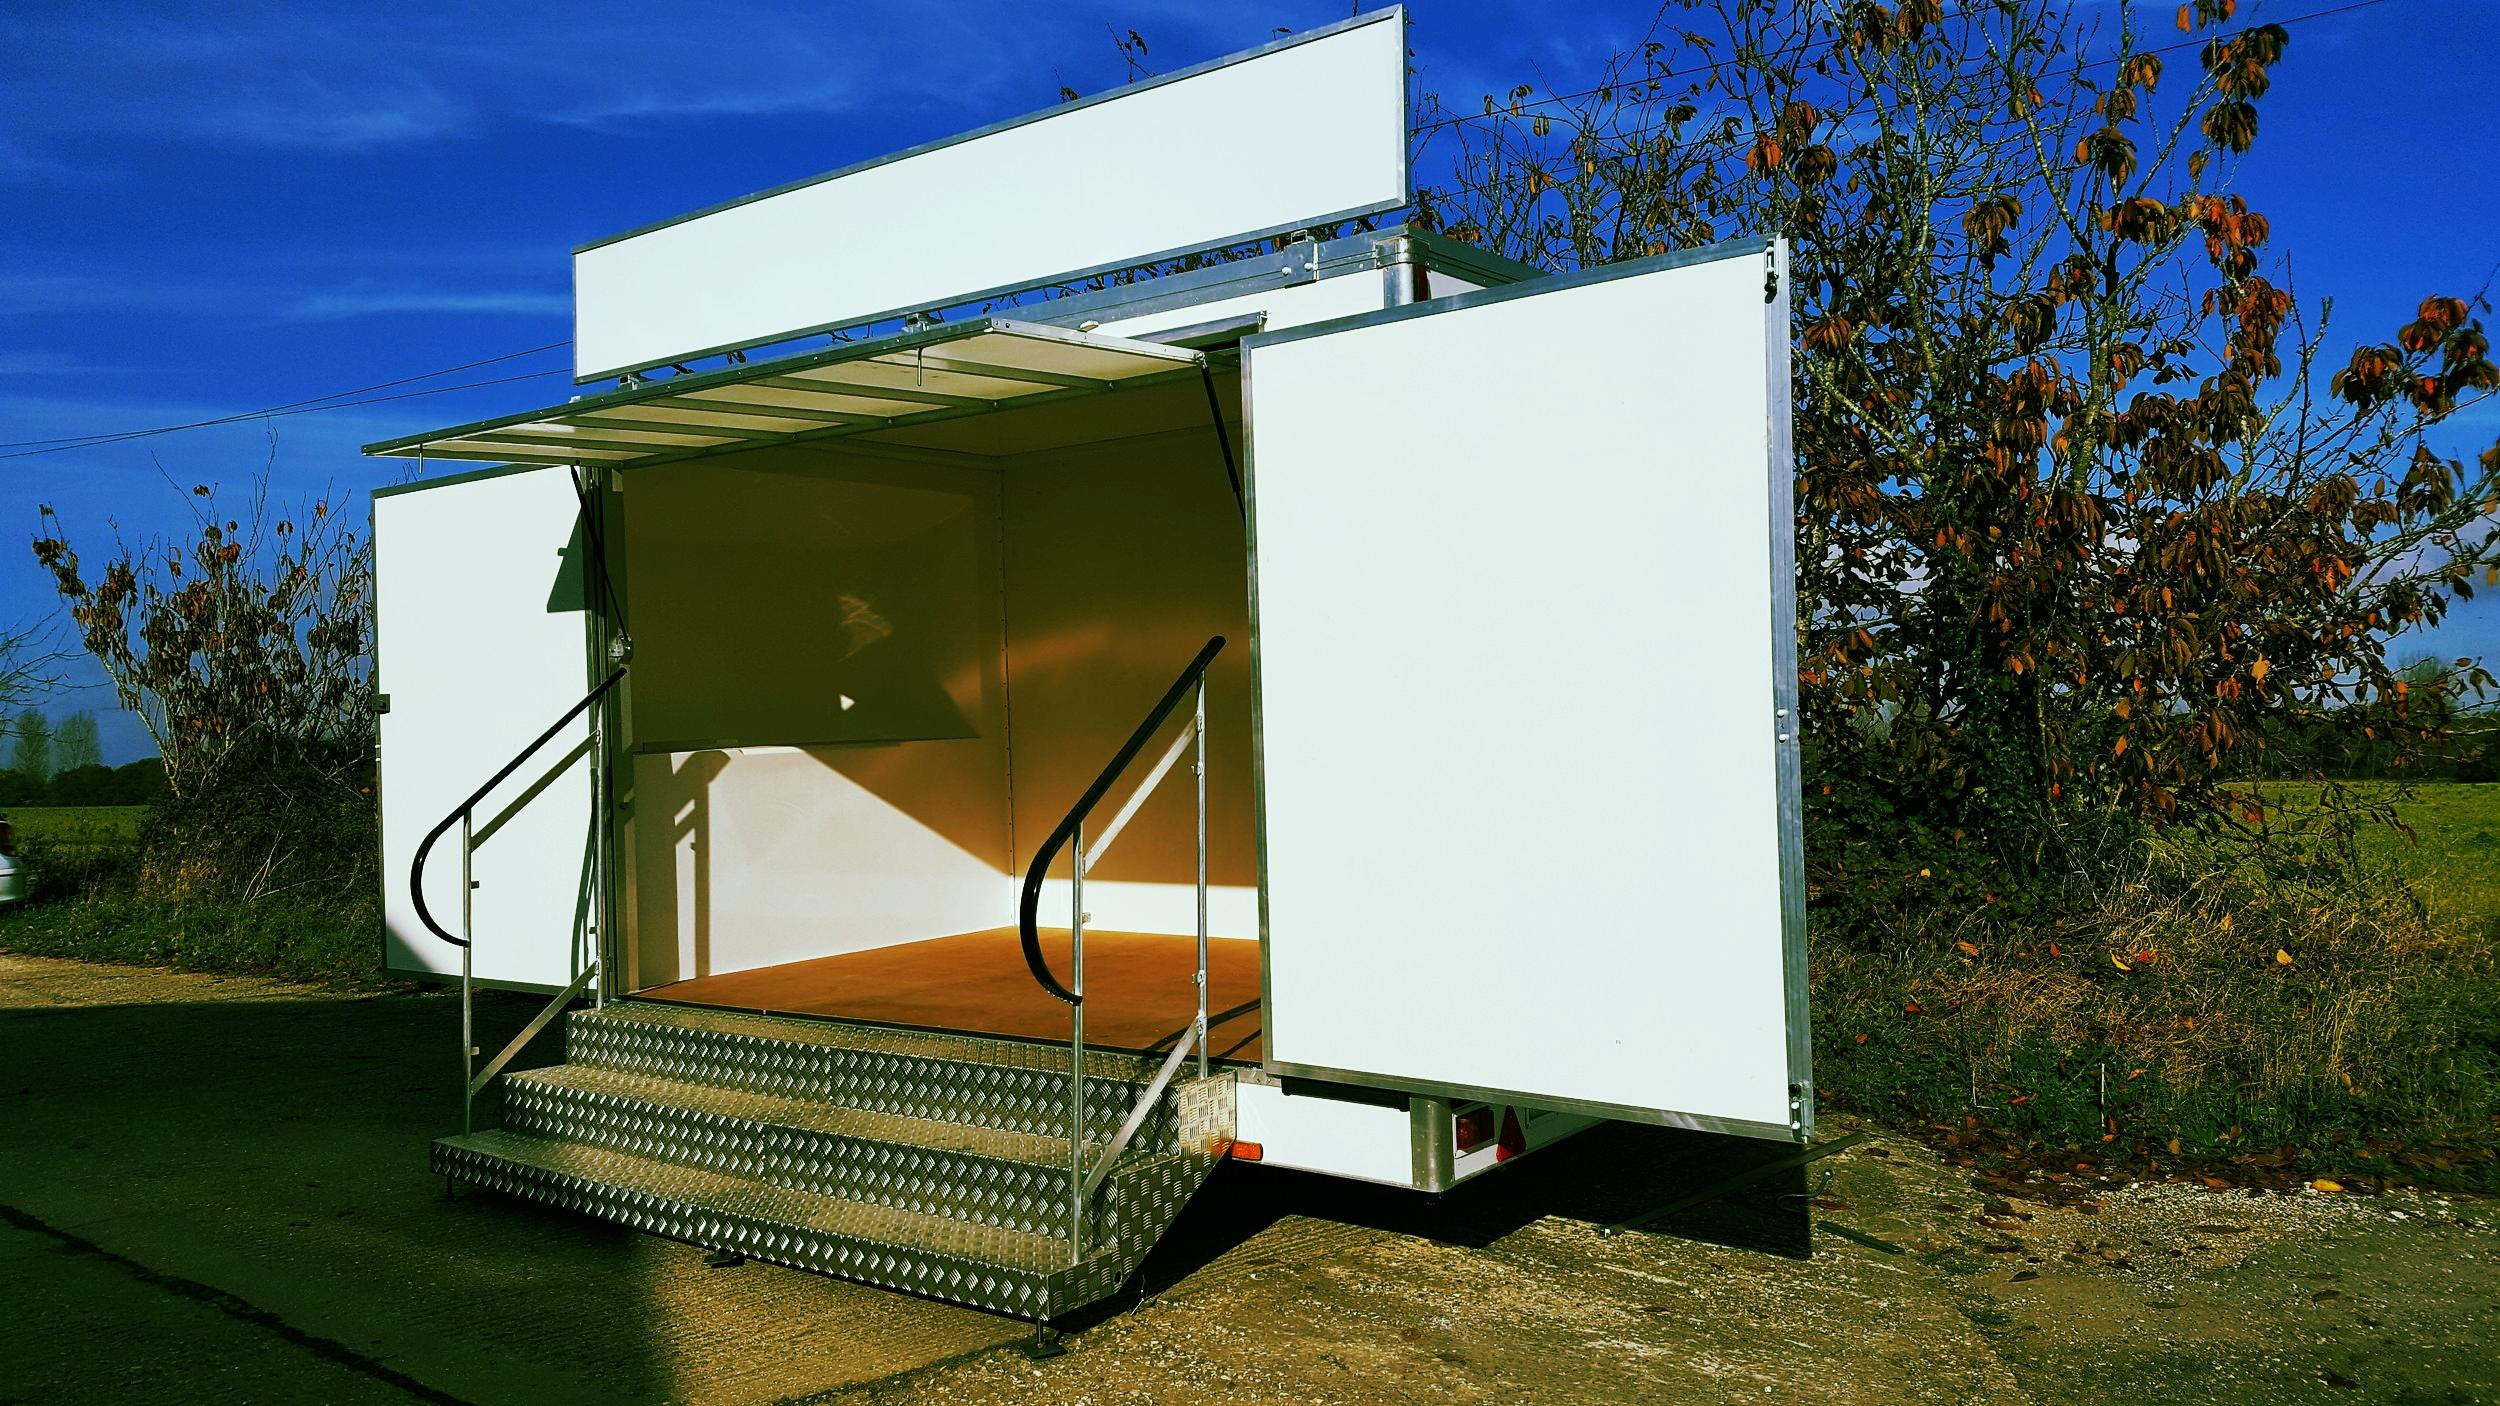 exhibitiontrailer.jpg